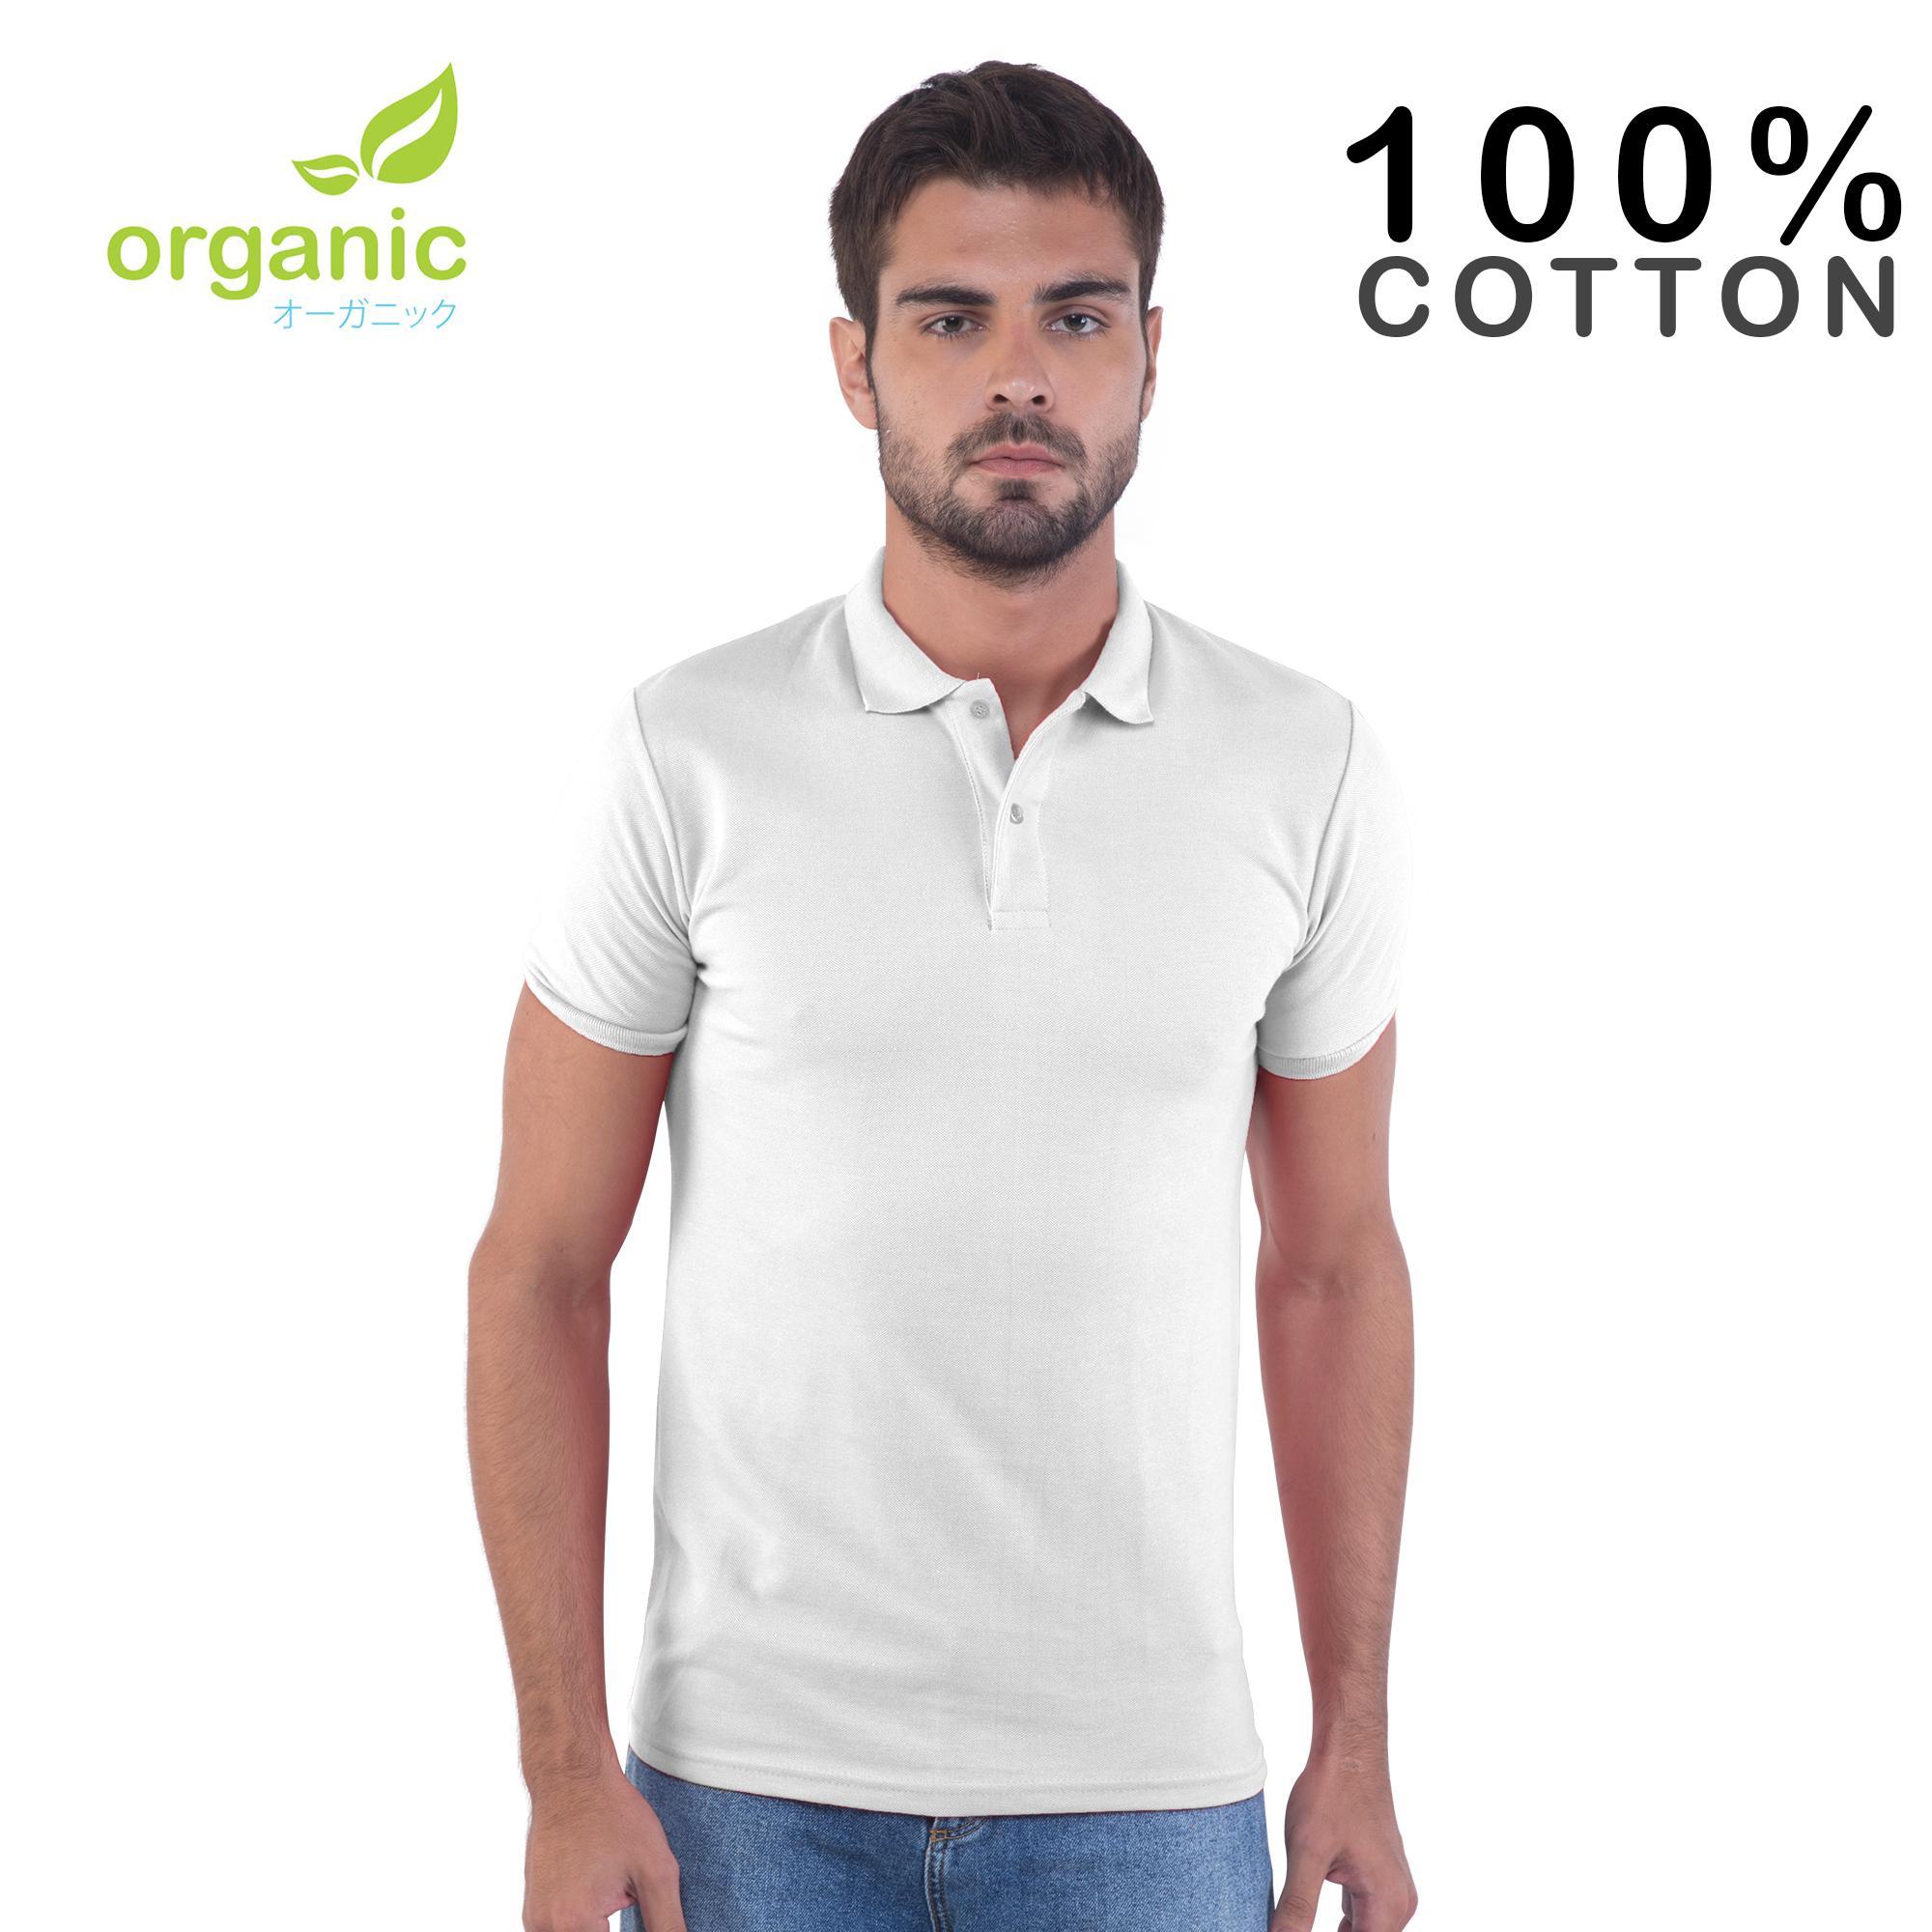 95da6a9cd5f Organic Mens Pique Polo Shirt (White) Tees t shirt tshirt shirts tshirts  tee tops